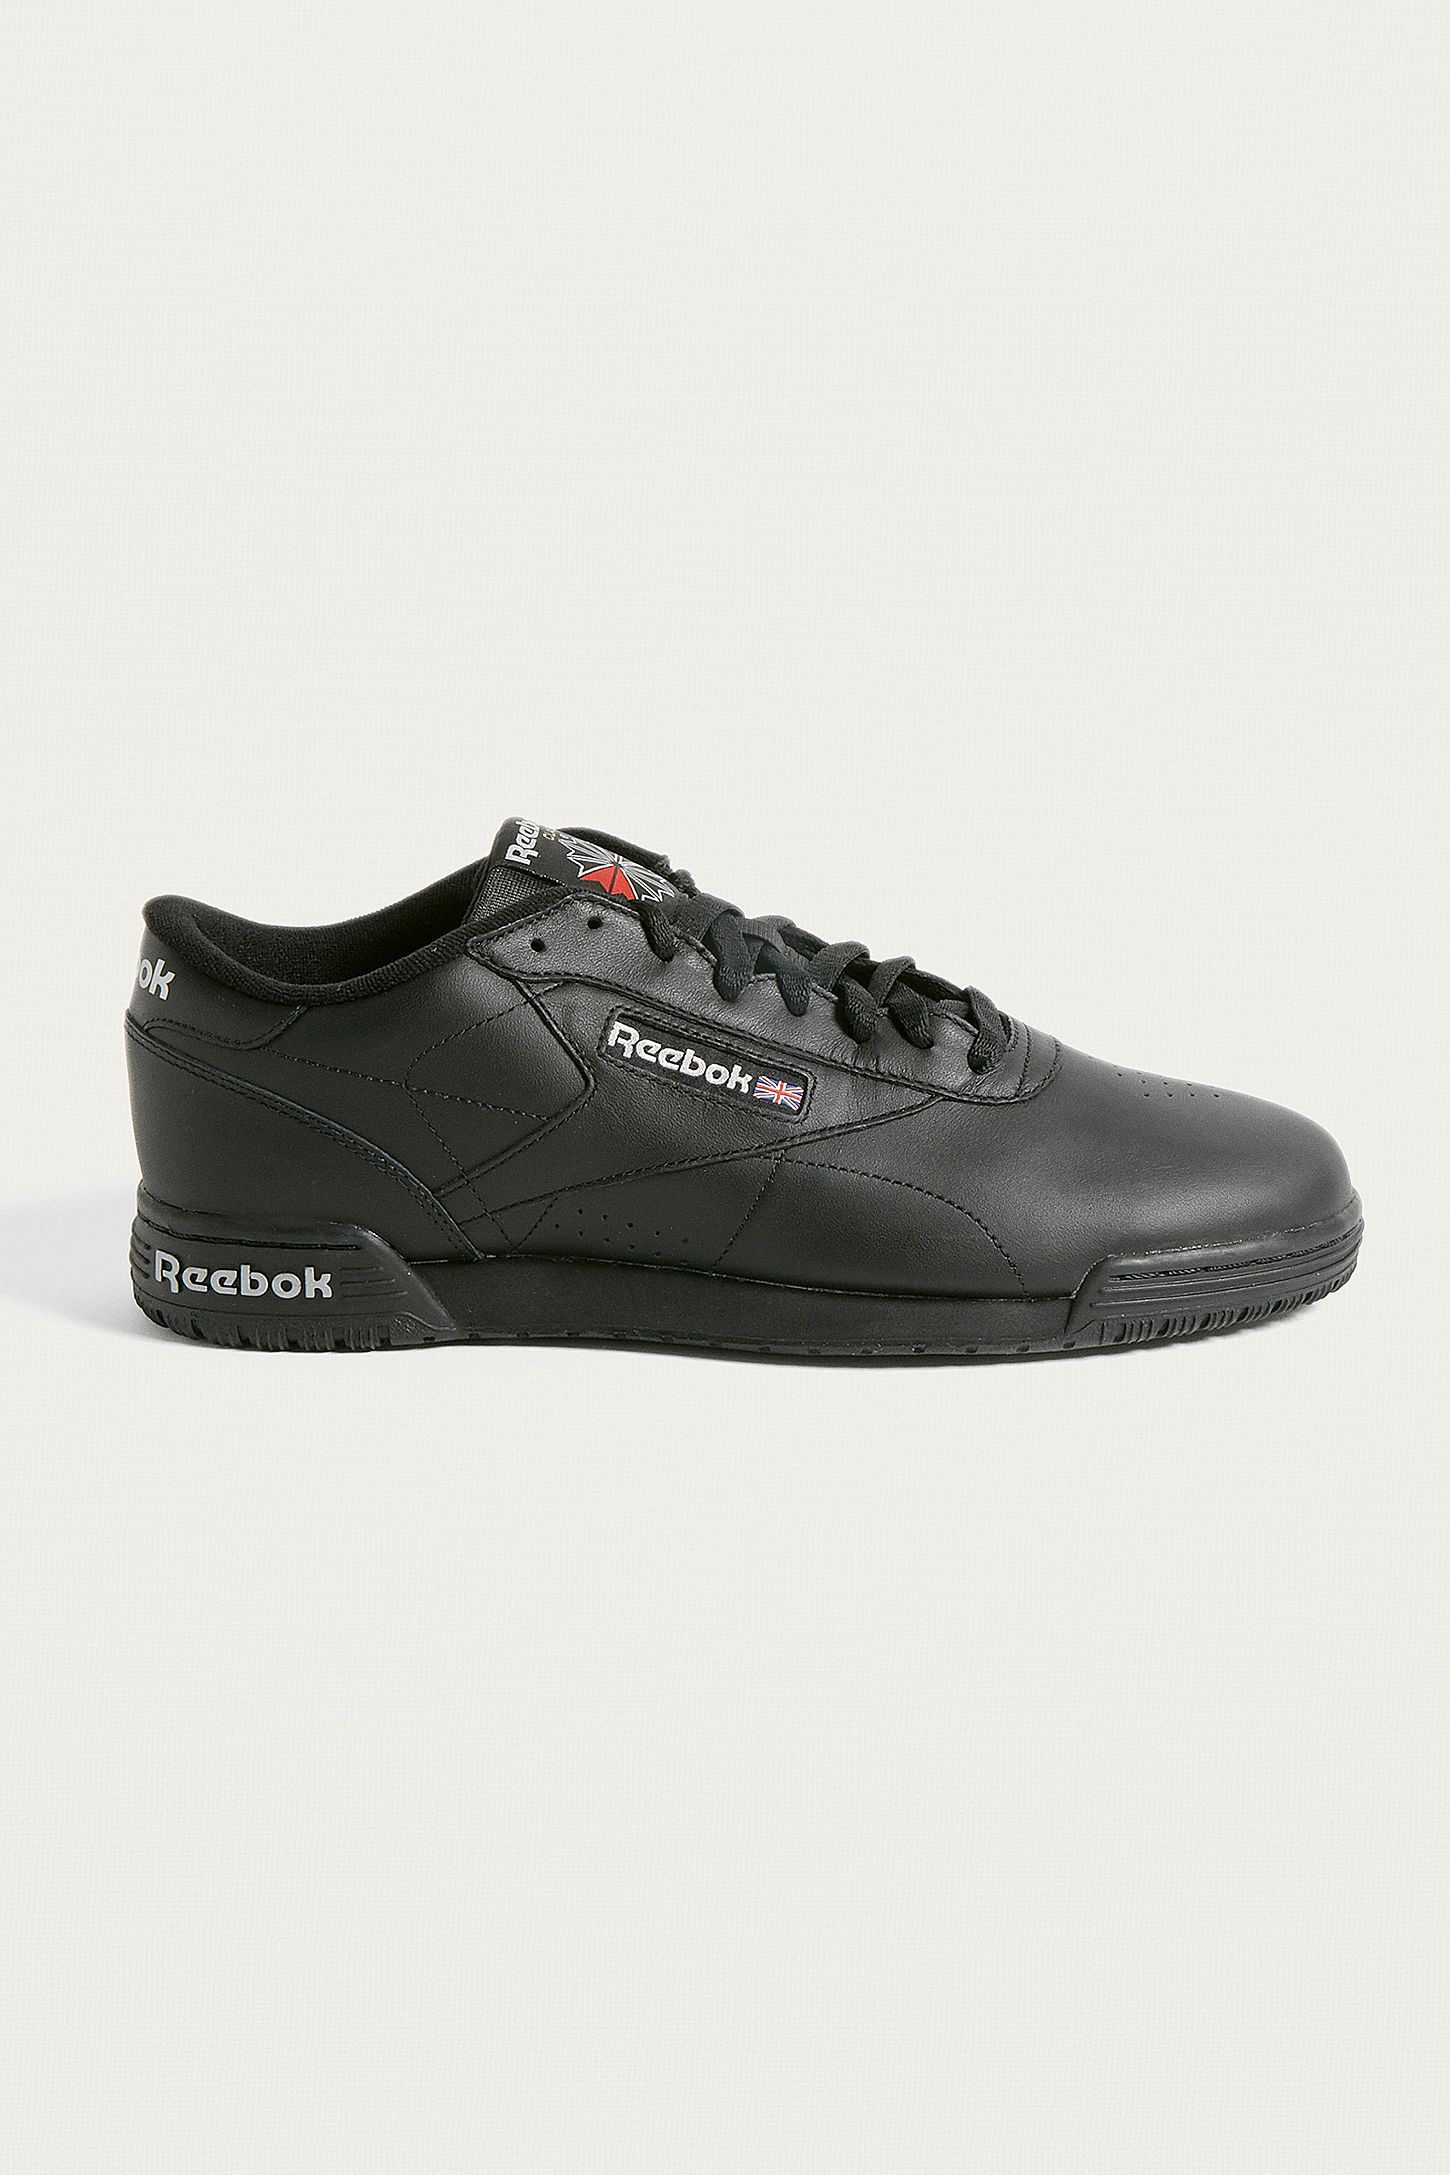 2beb5e05c5b3 Reebok Ex-O-Fit Lo Clean Logo Black Trainers